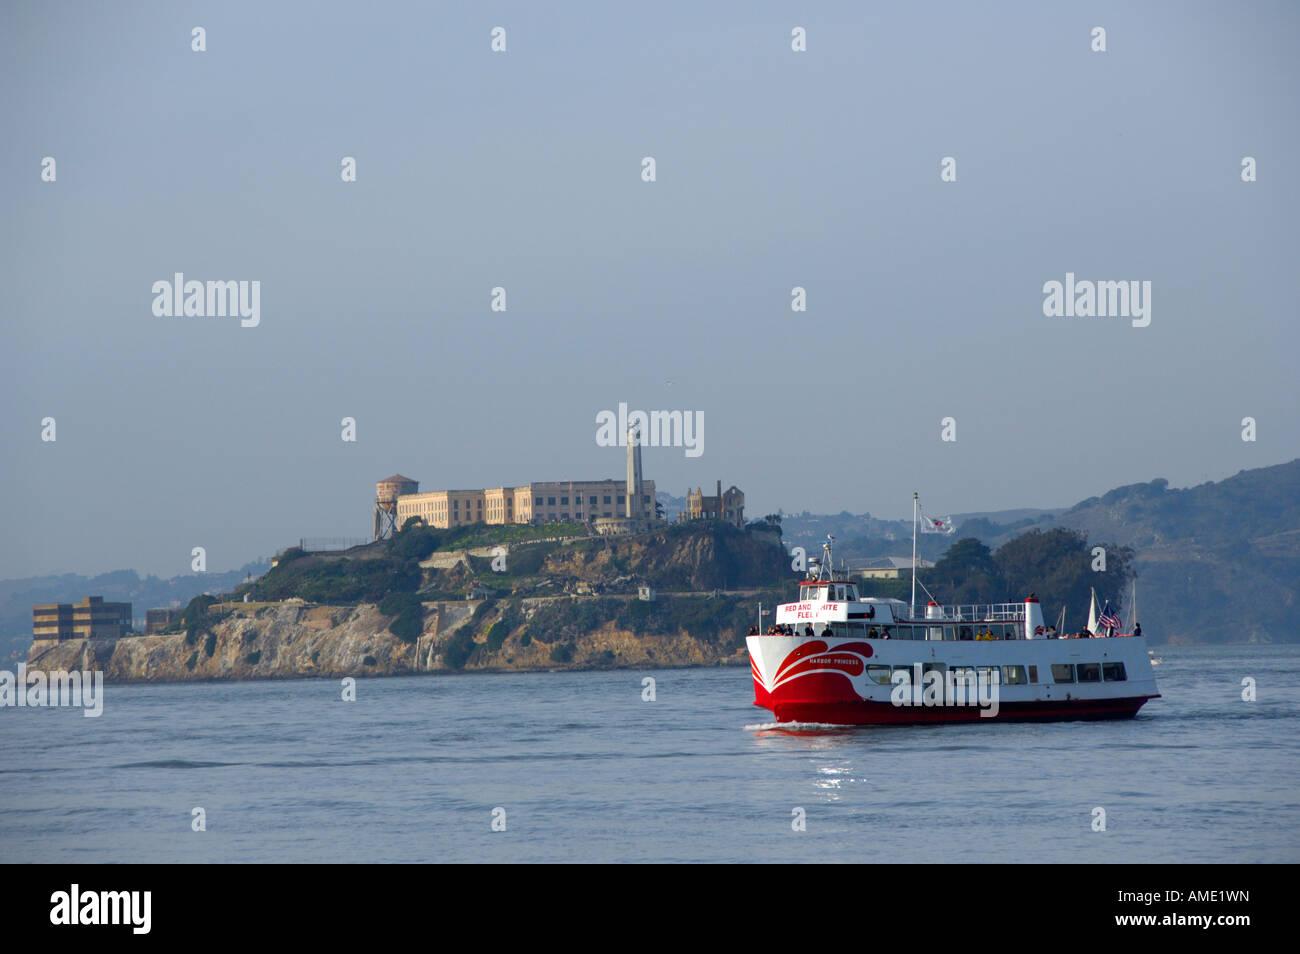 California, San Francisco. Golden Gate National Recreation Area, Alcatraz Island. - Stock Image